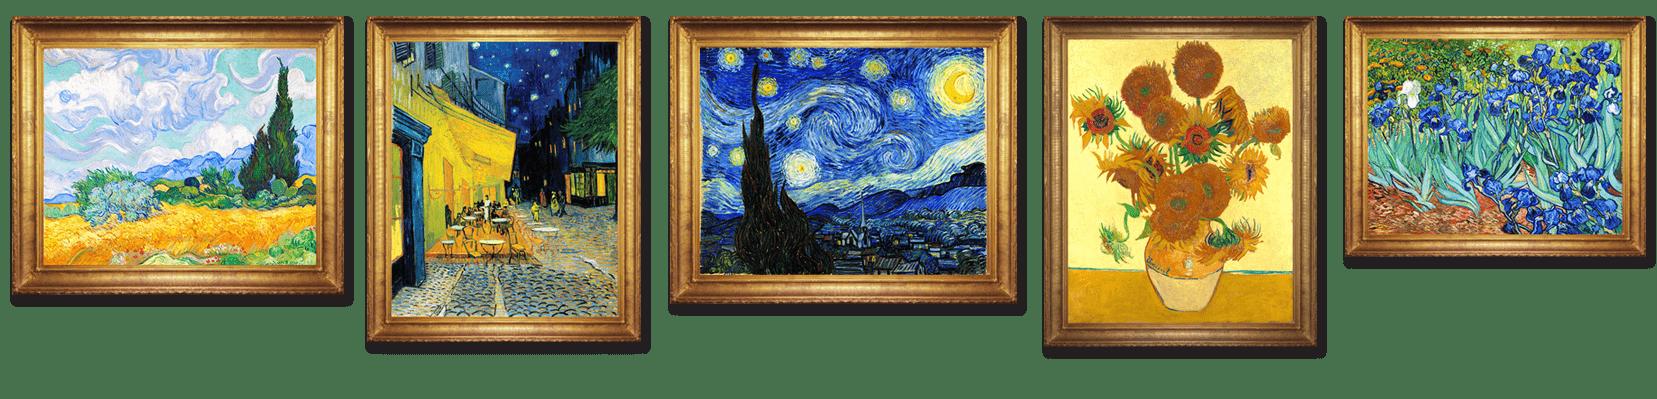 Paintings by Vincent Van Gogh